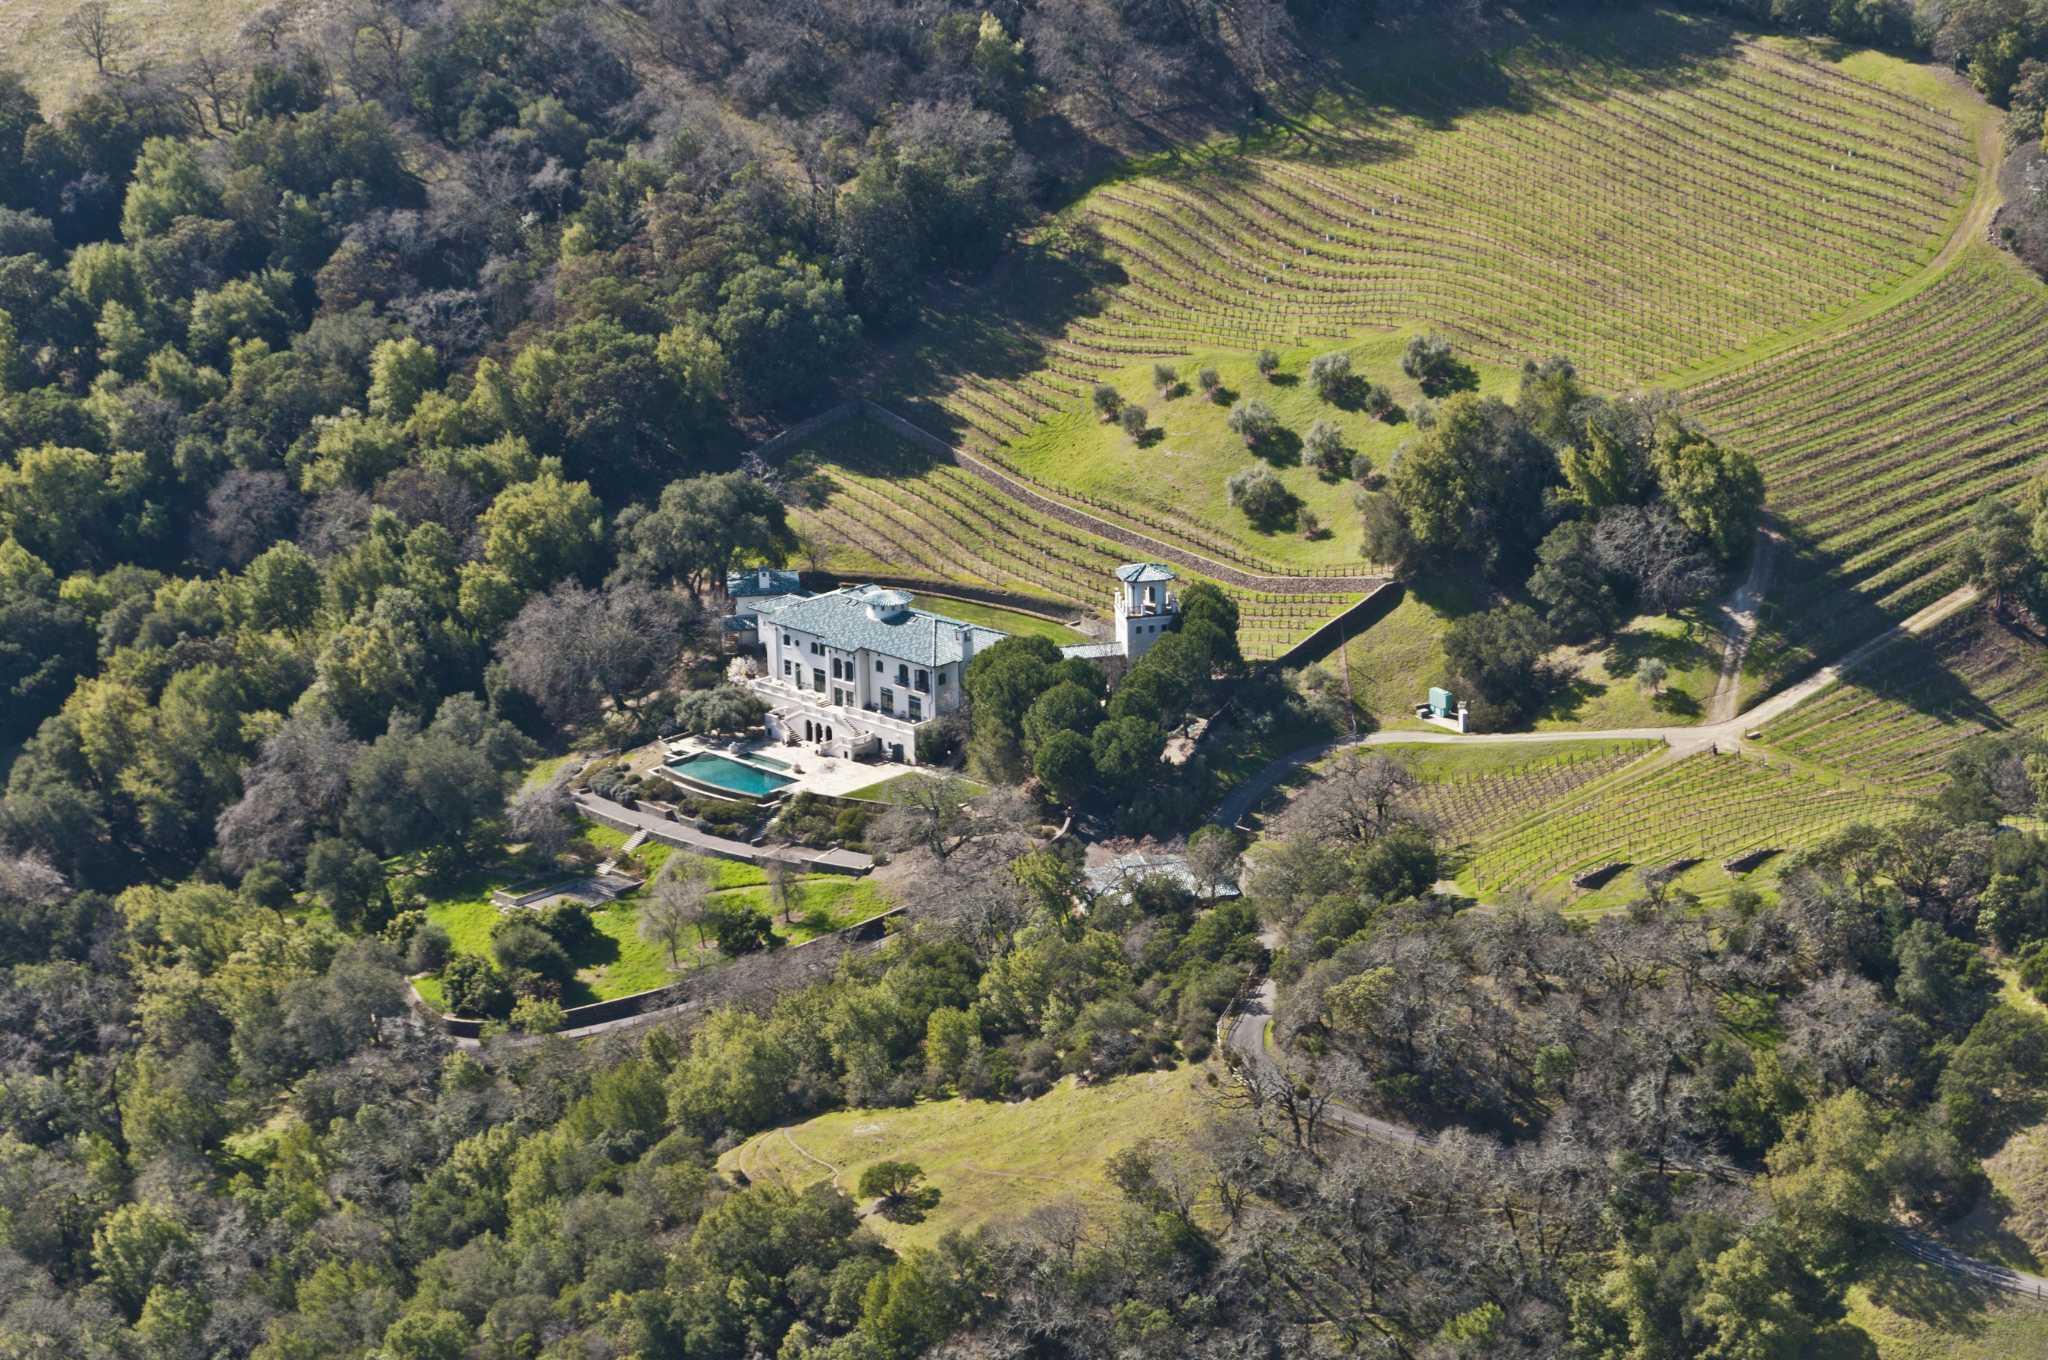 wine country fire reaches robin williams estate sfgate - Robin Williams Houses